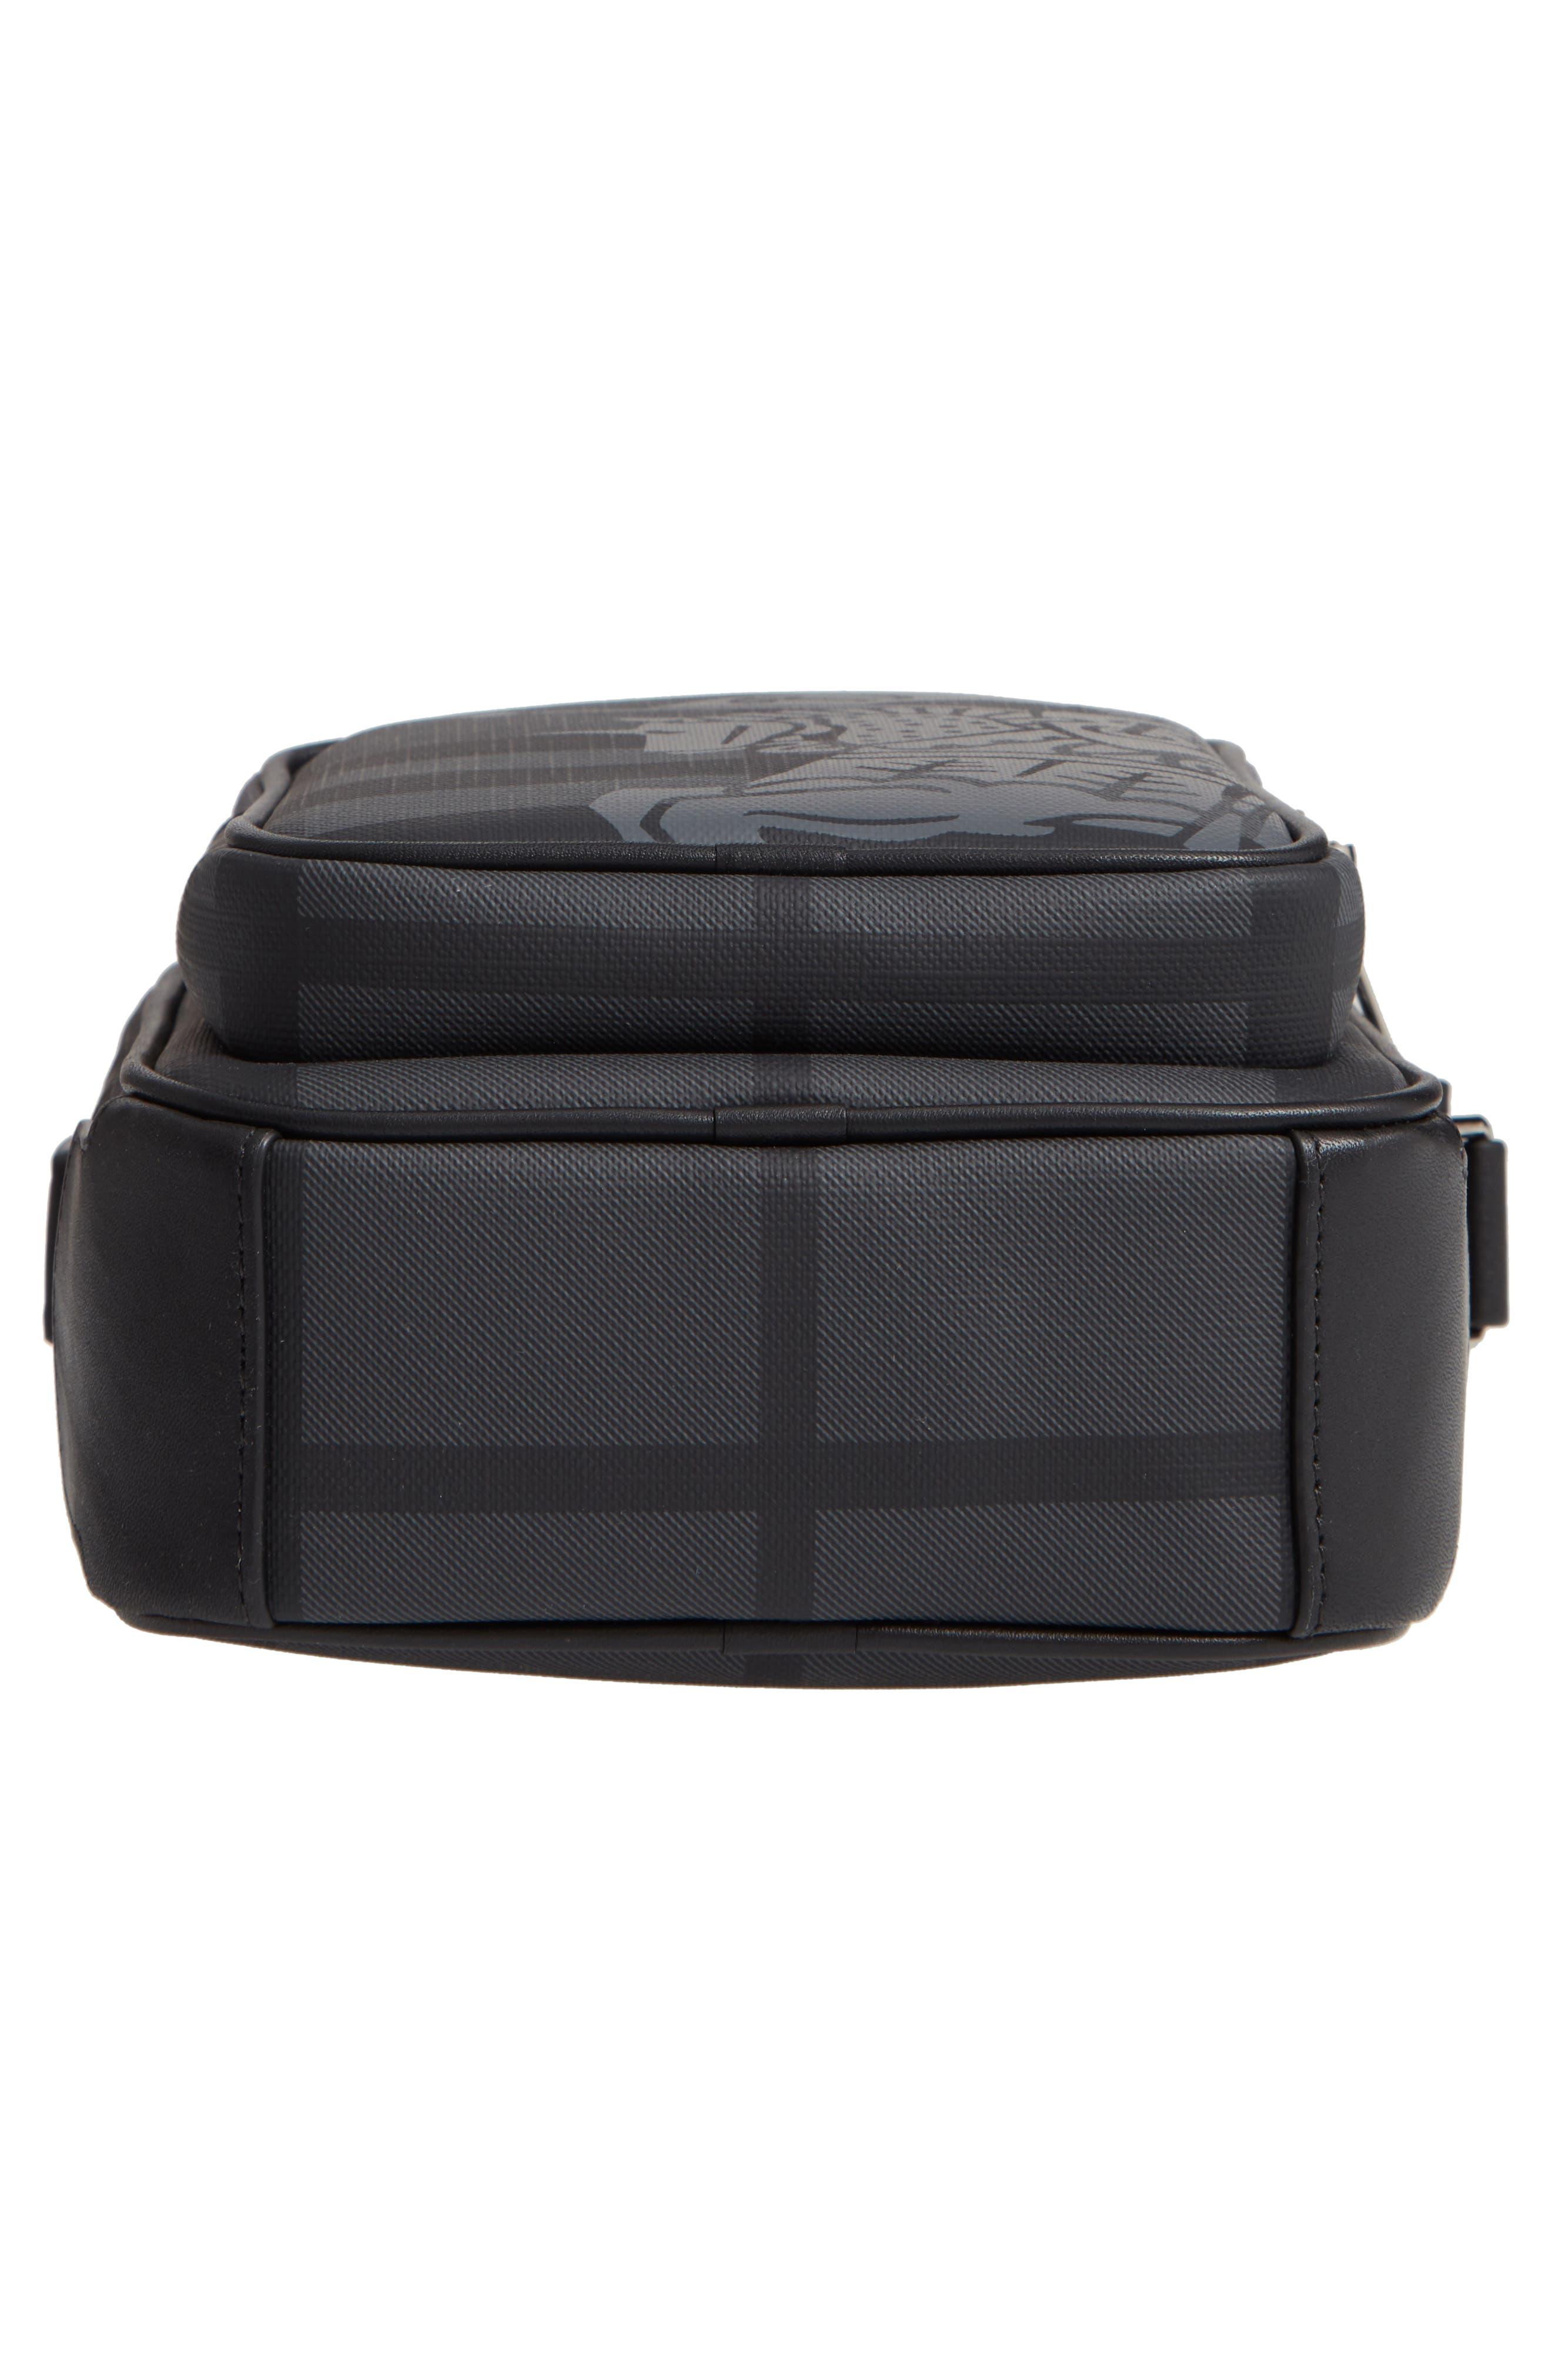 Freddie London Check Compact Messenger Bag,                             Alternate thumbnail 6, color,                             CHARCOAL BLACK